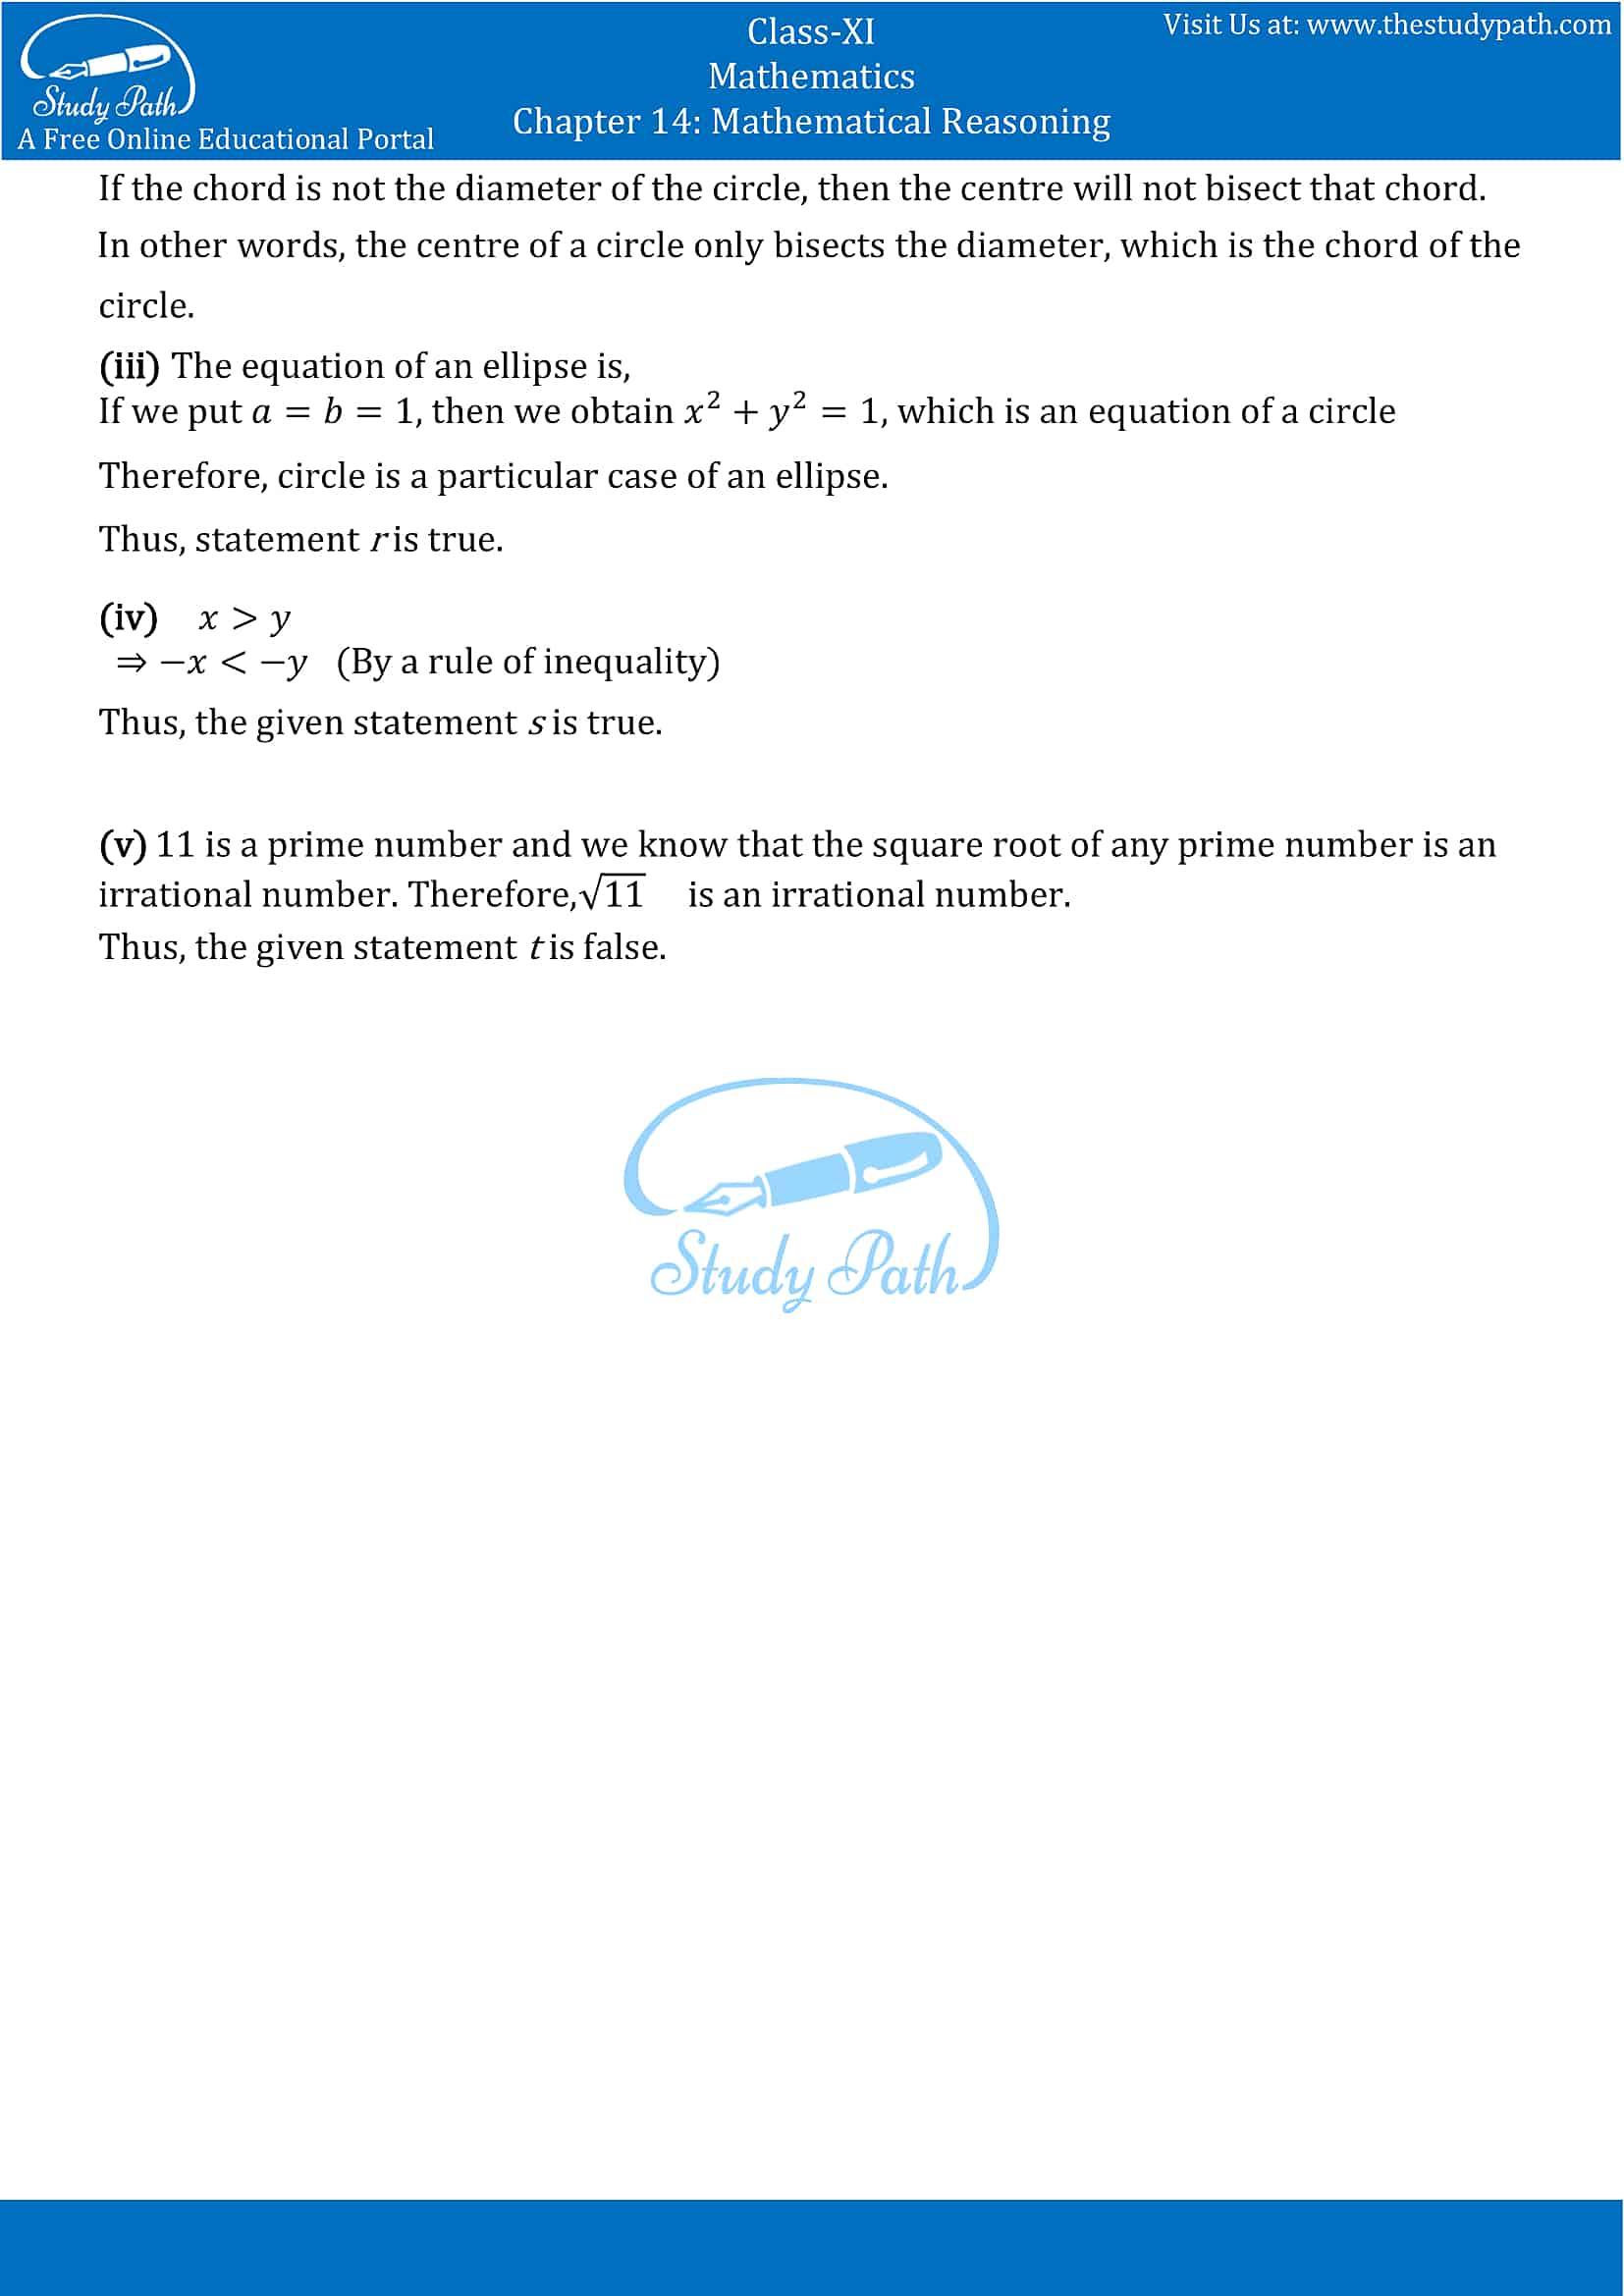 NCERT Solutions for Class 11 Maths Chapter 14 Mathematical Reasoning Part 12